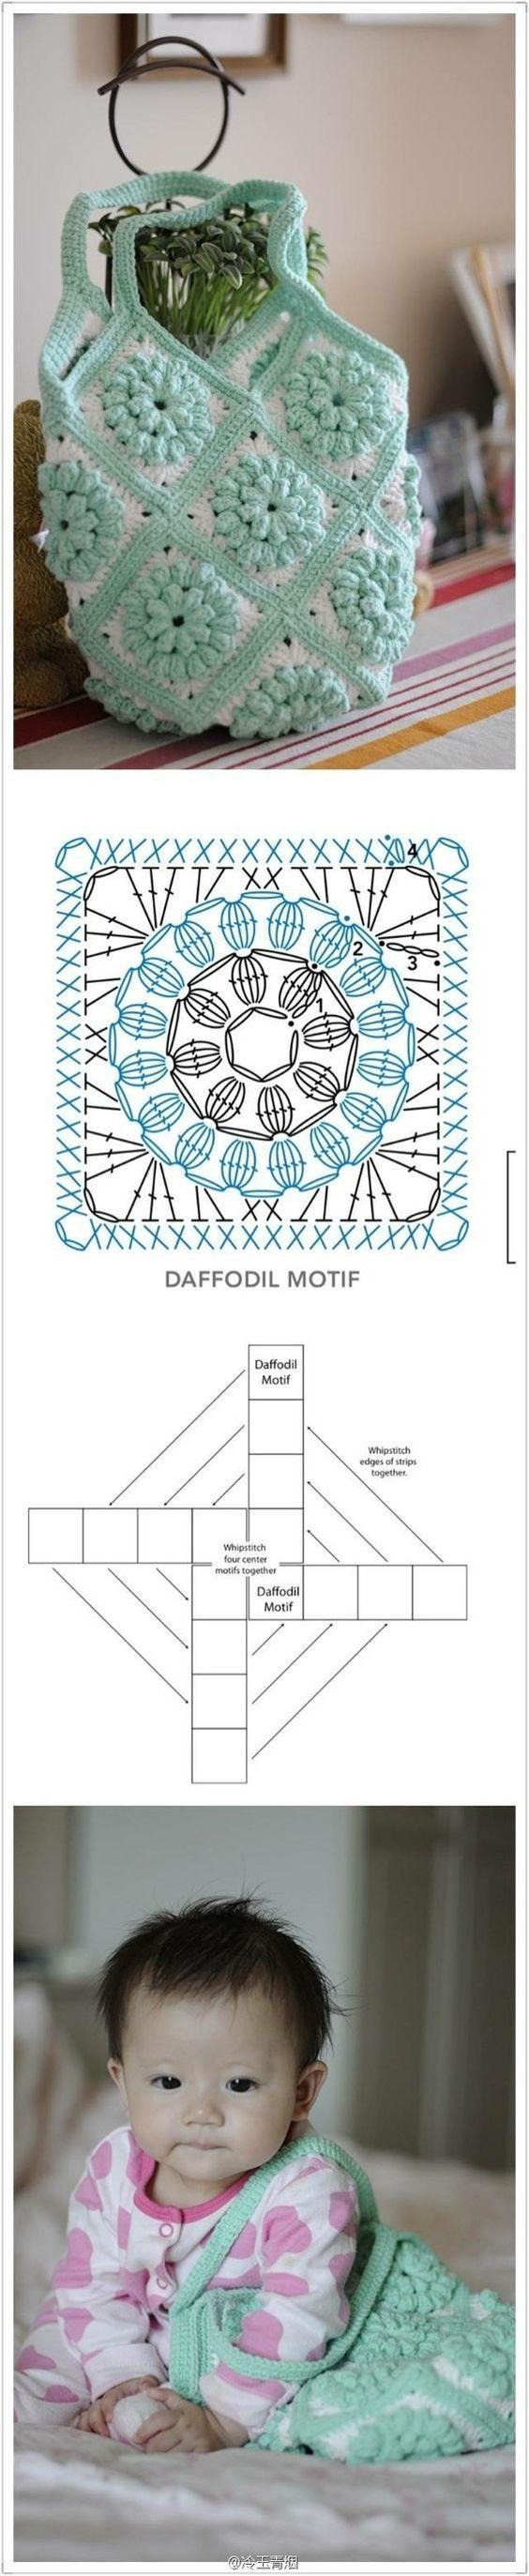 bag crochet pattern: